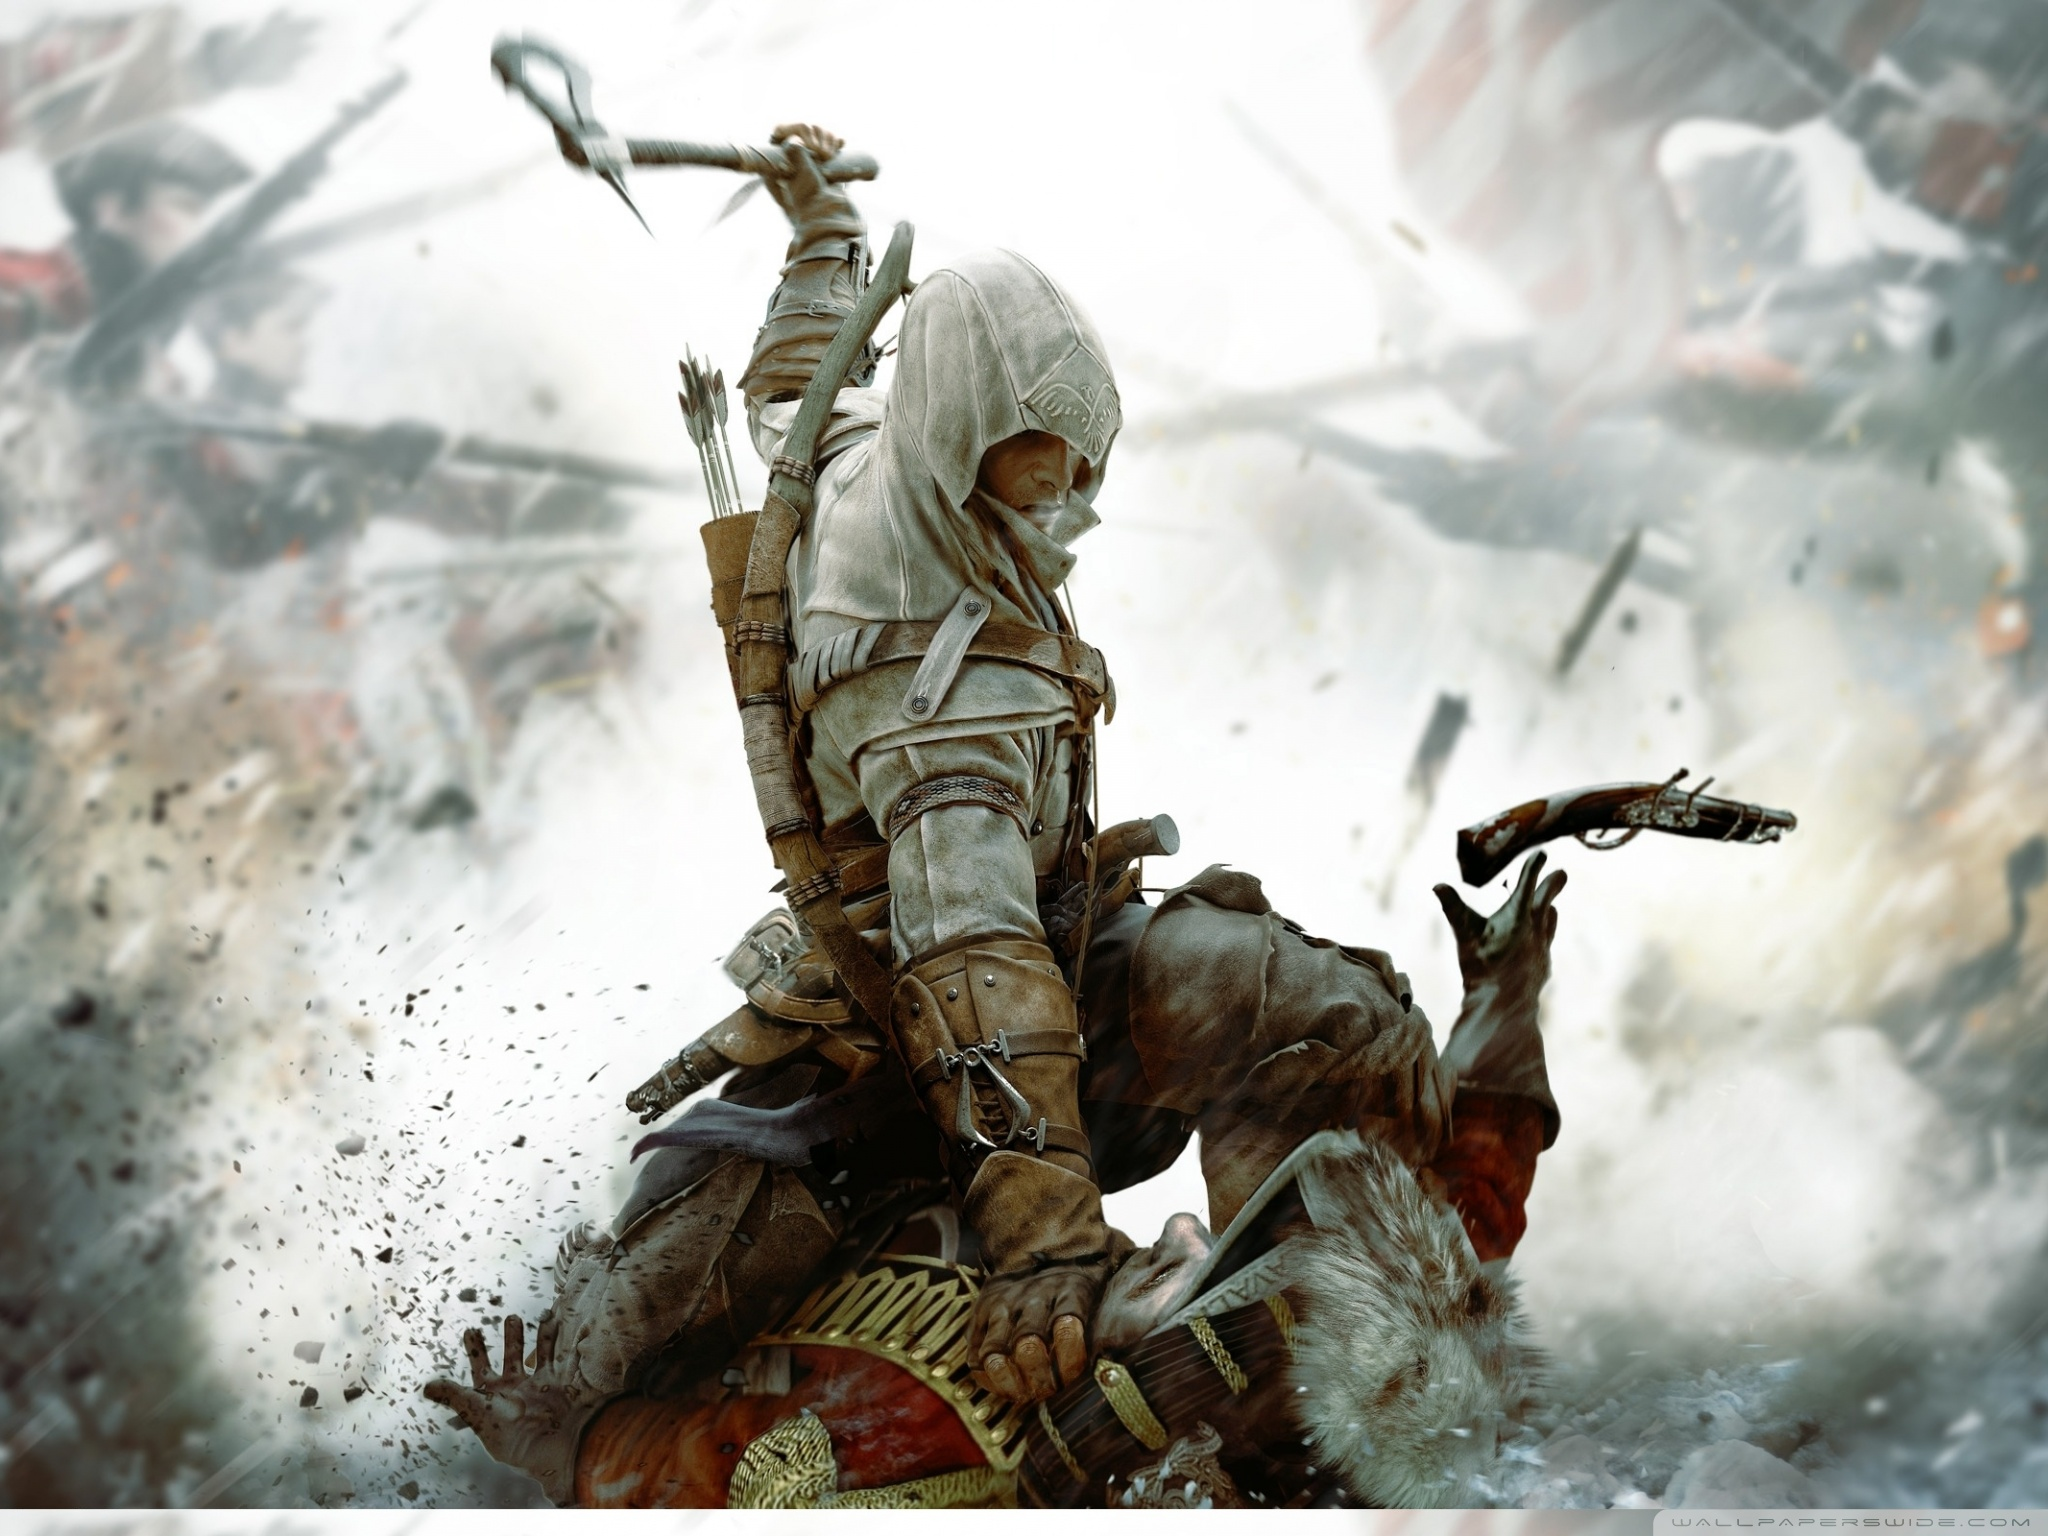 Free Download Assassins Creed Iii 4k Hd Desktop Wallpaper For 4k